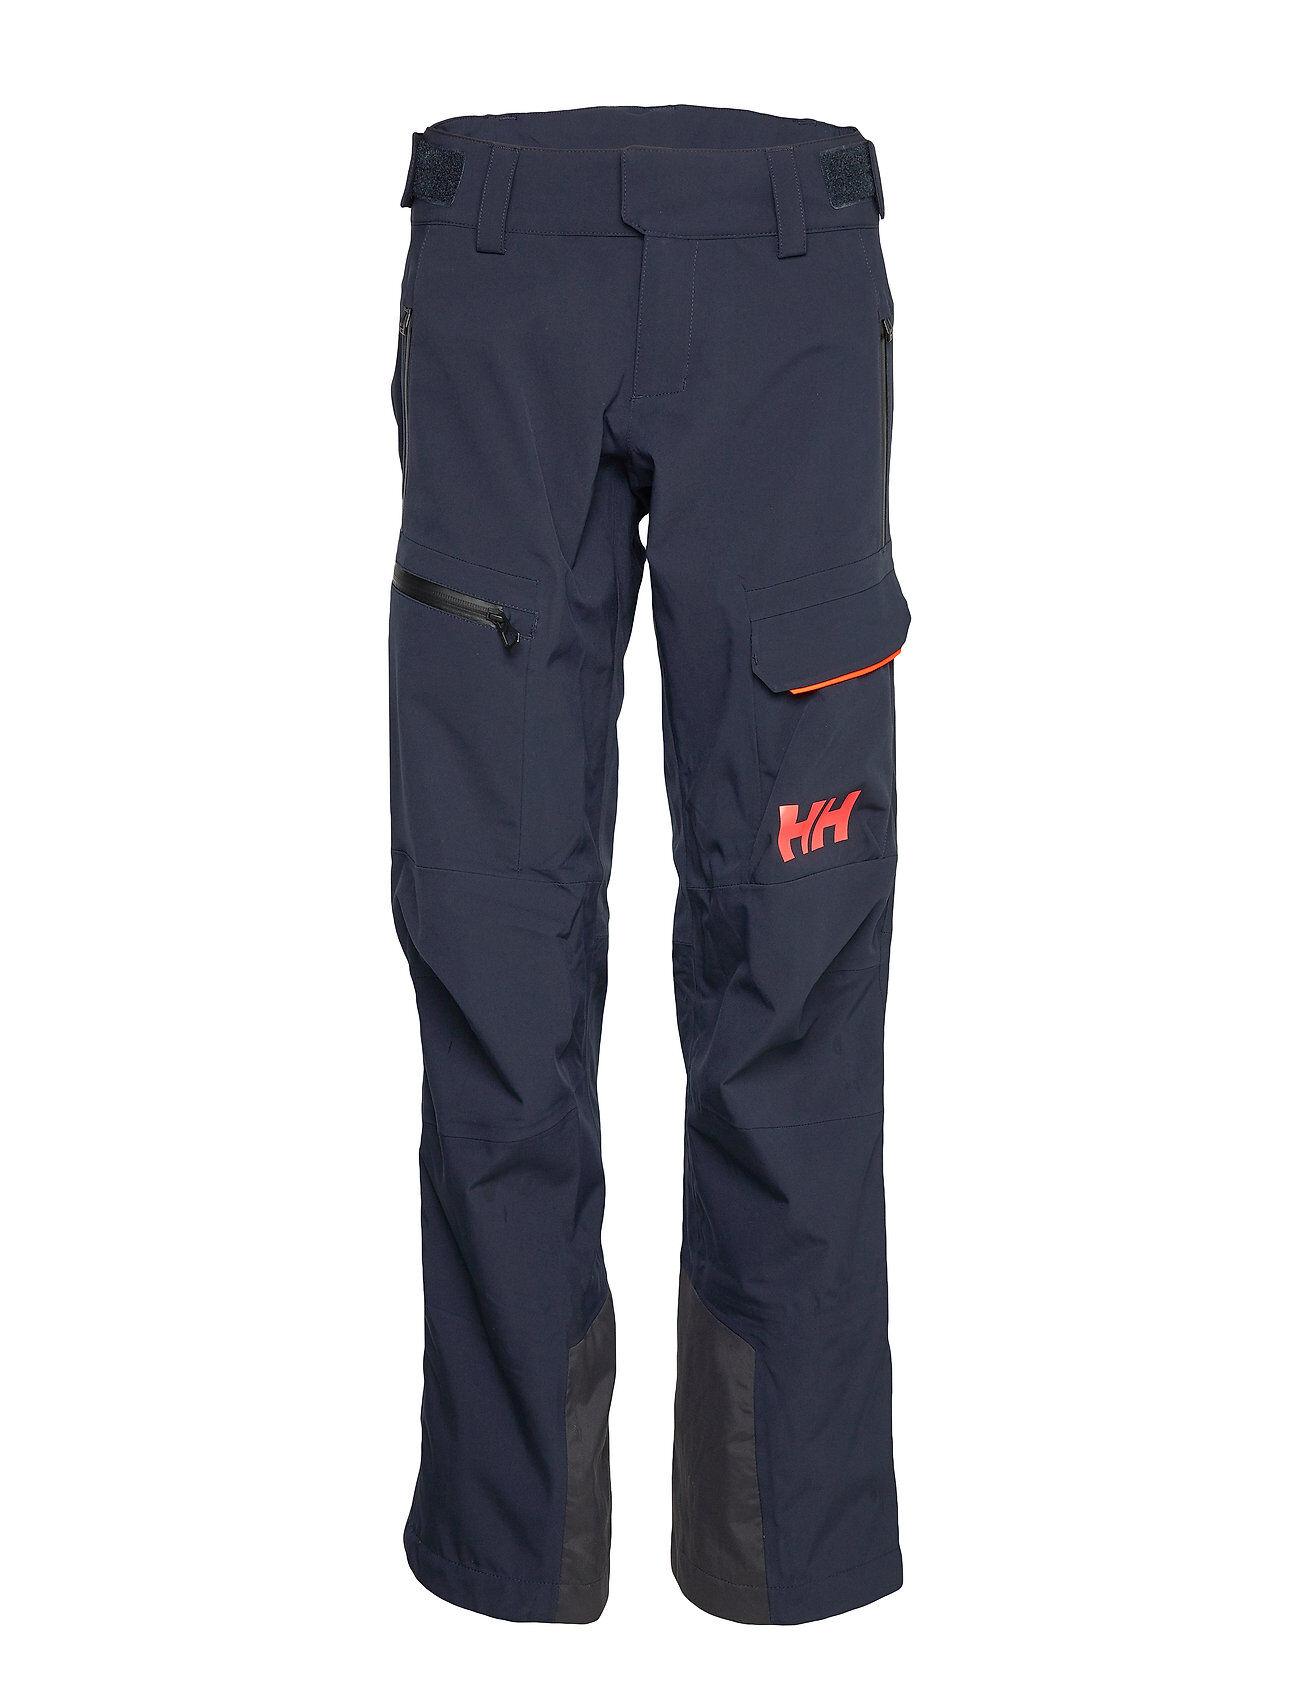 Image of Helly Hansen W Aurora Shell 2.0 Pant Sport Pants Sininen